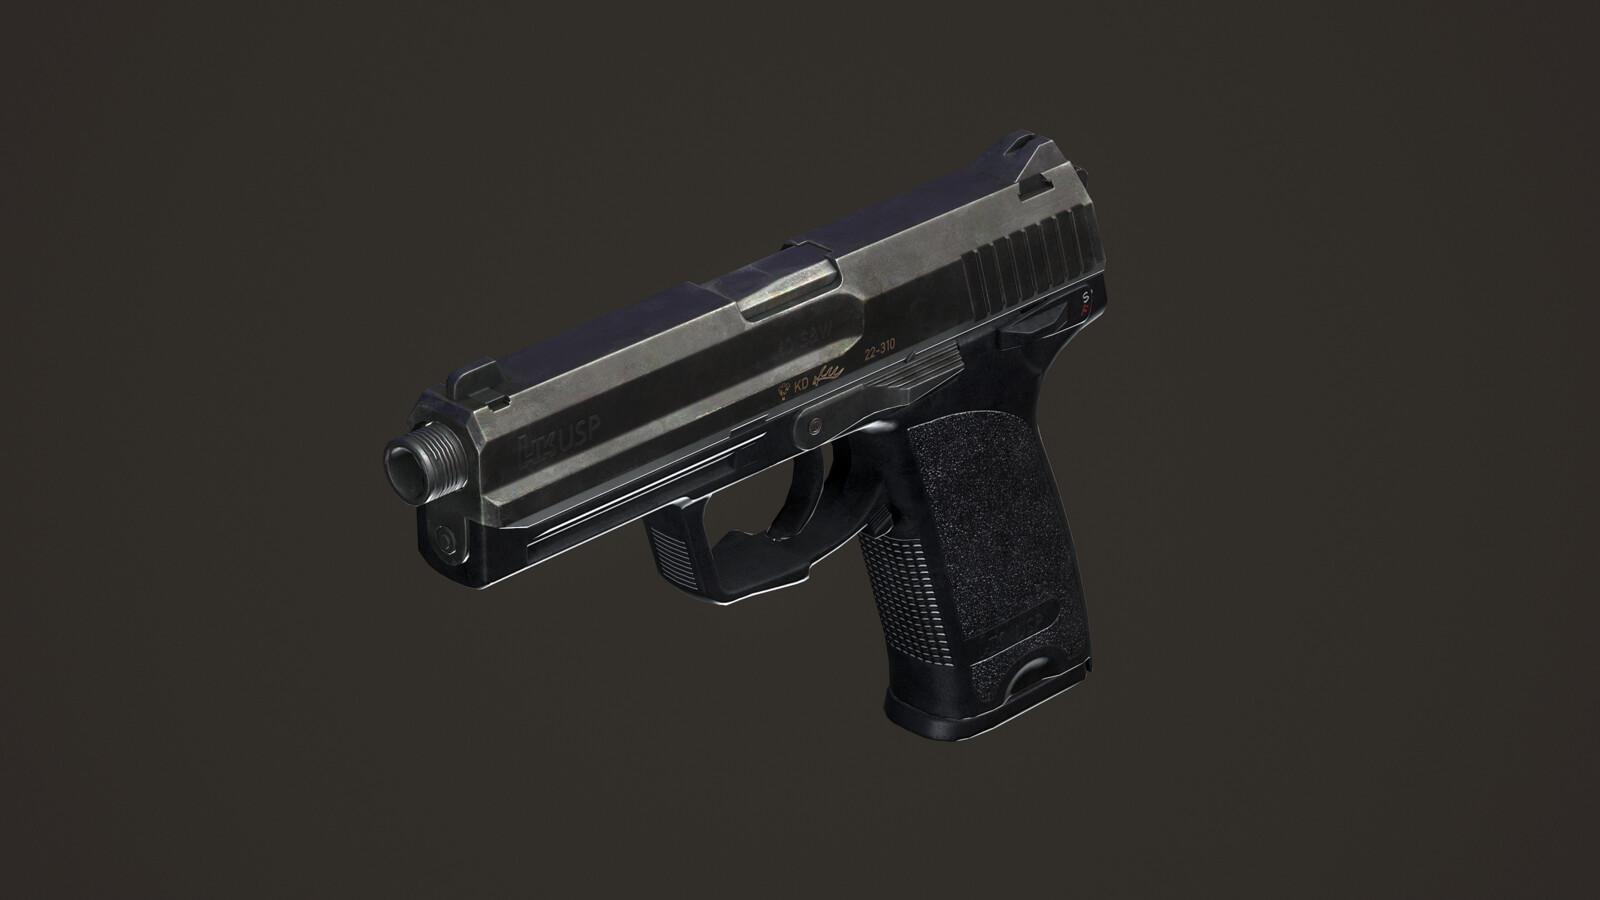 The USP .40